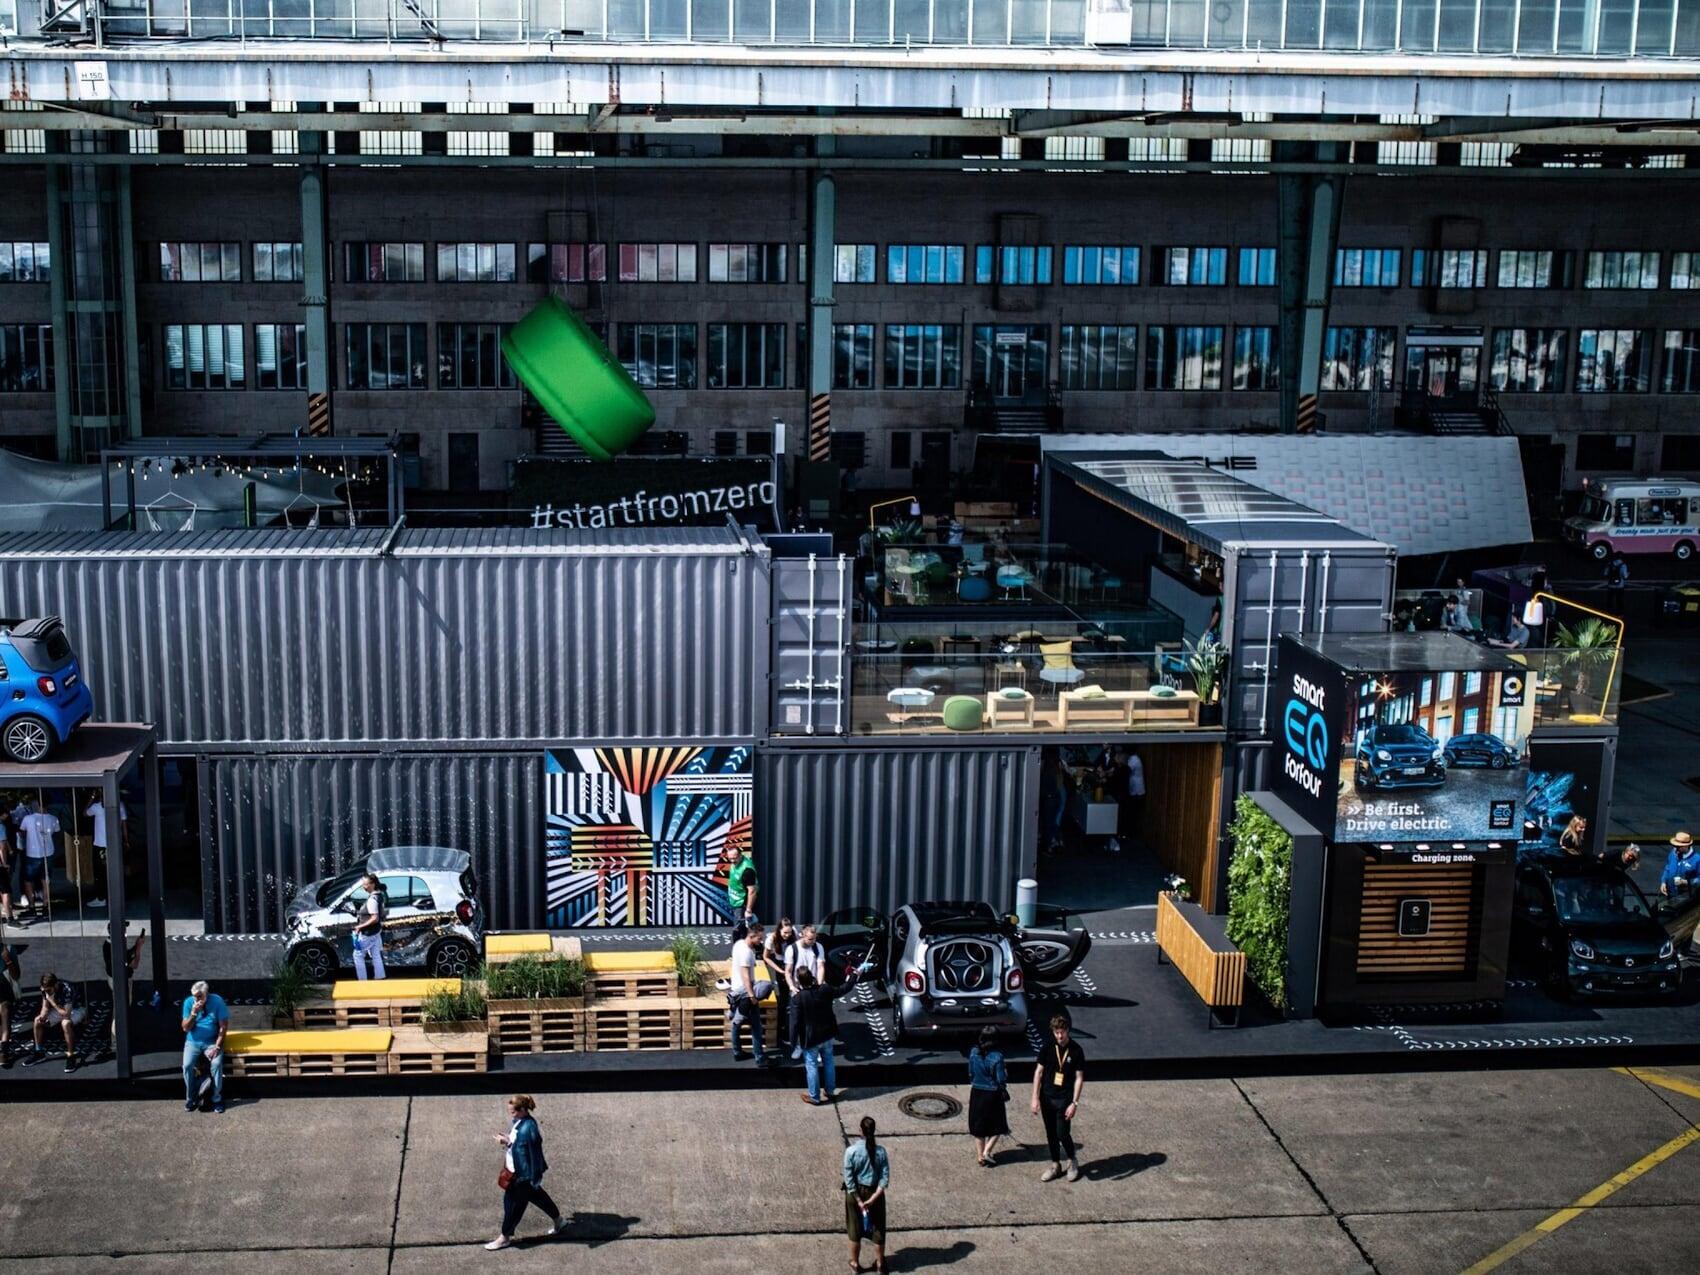 Experimentar smart - Fórmula E en Berlín